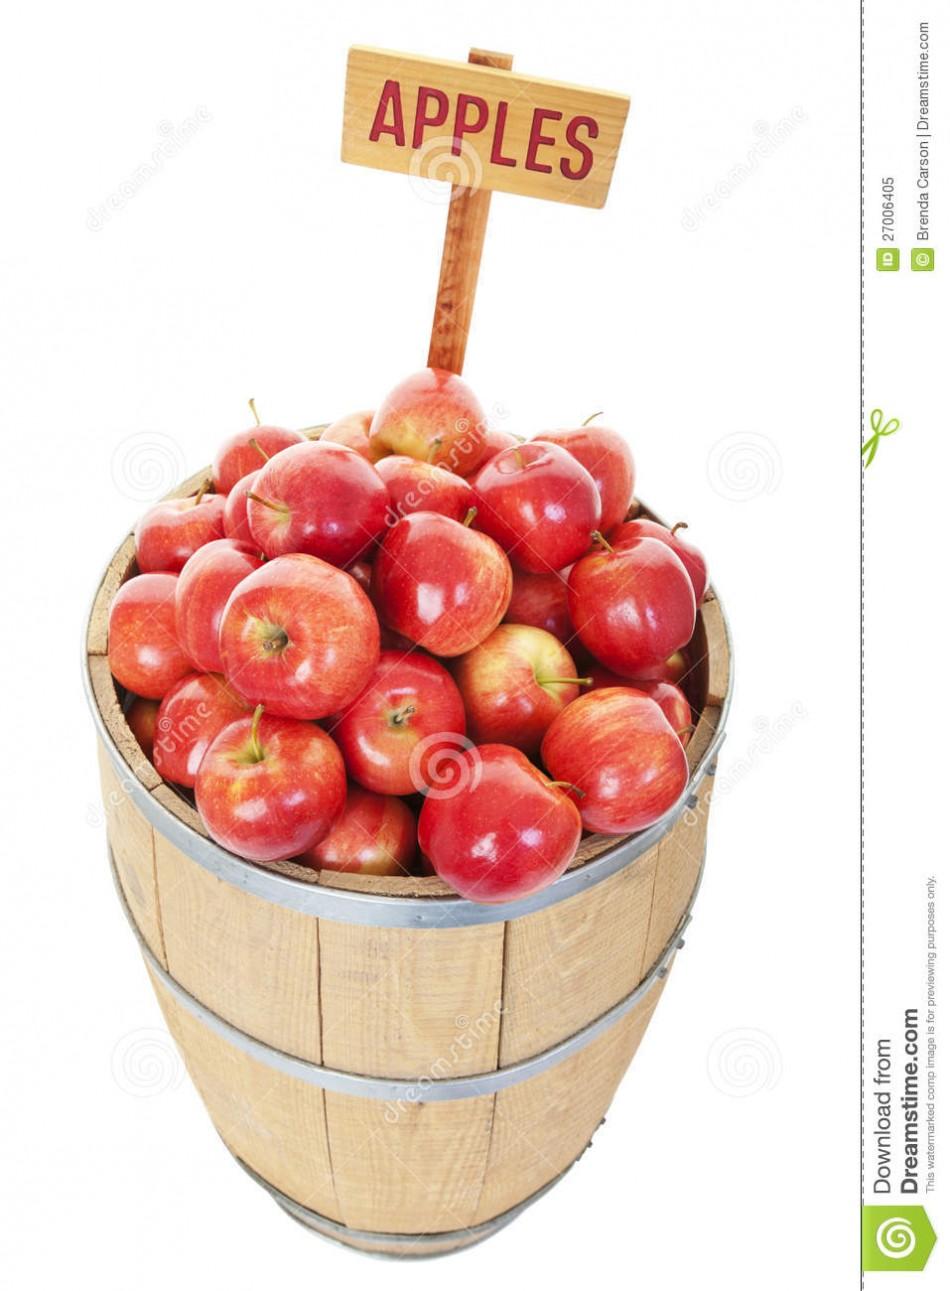 apple-barrel-27006405.jpg